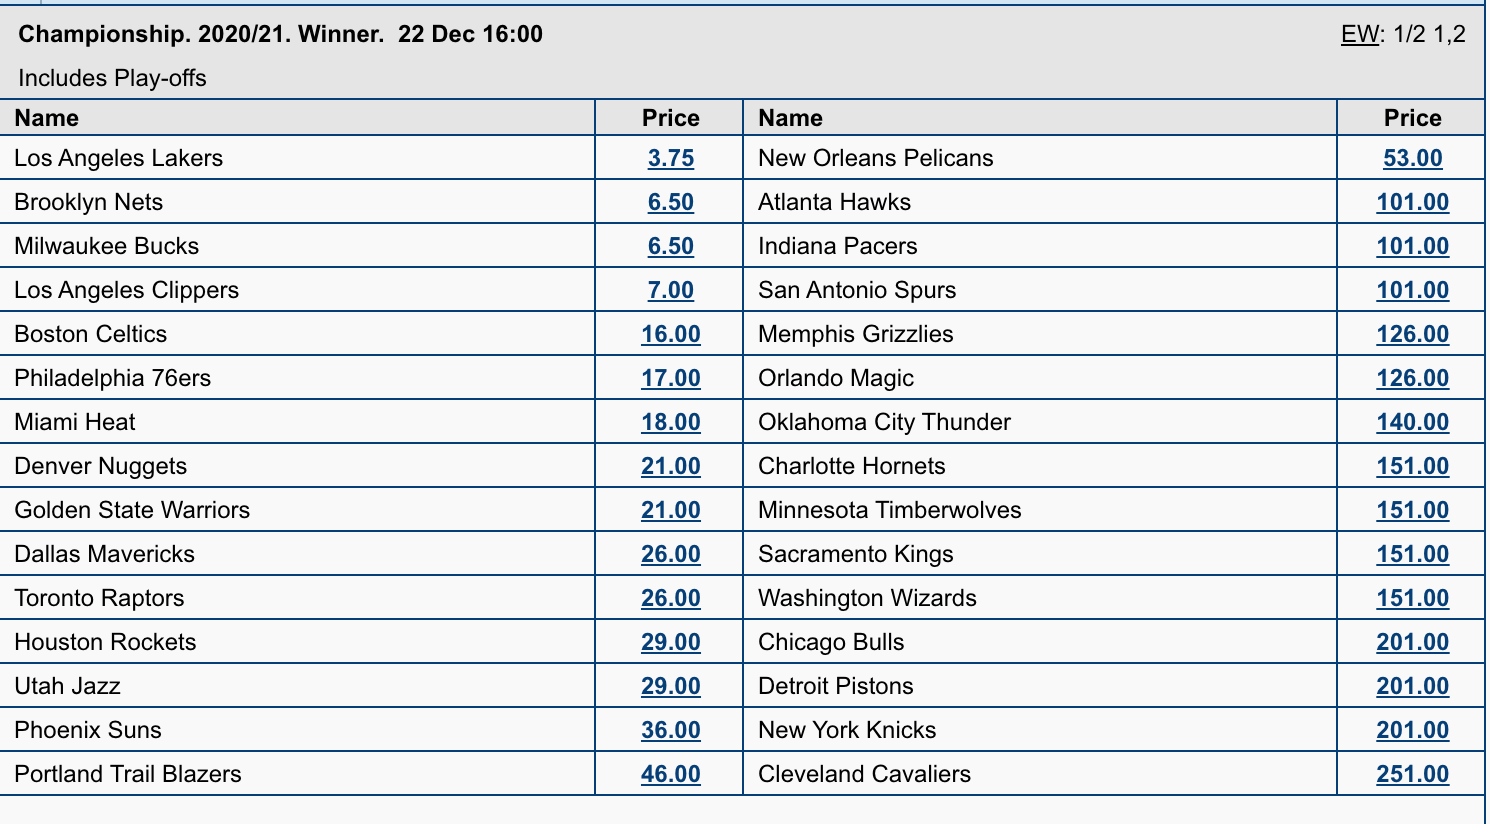 NBAチャンピオンシップウィナー2020-21シーズンオッズ